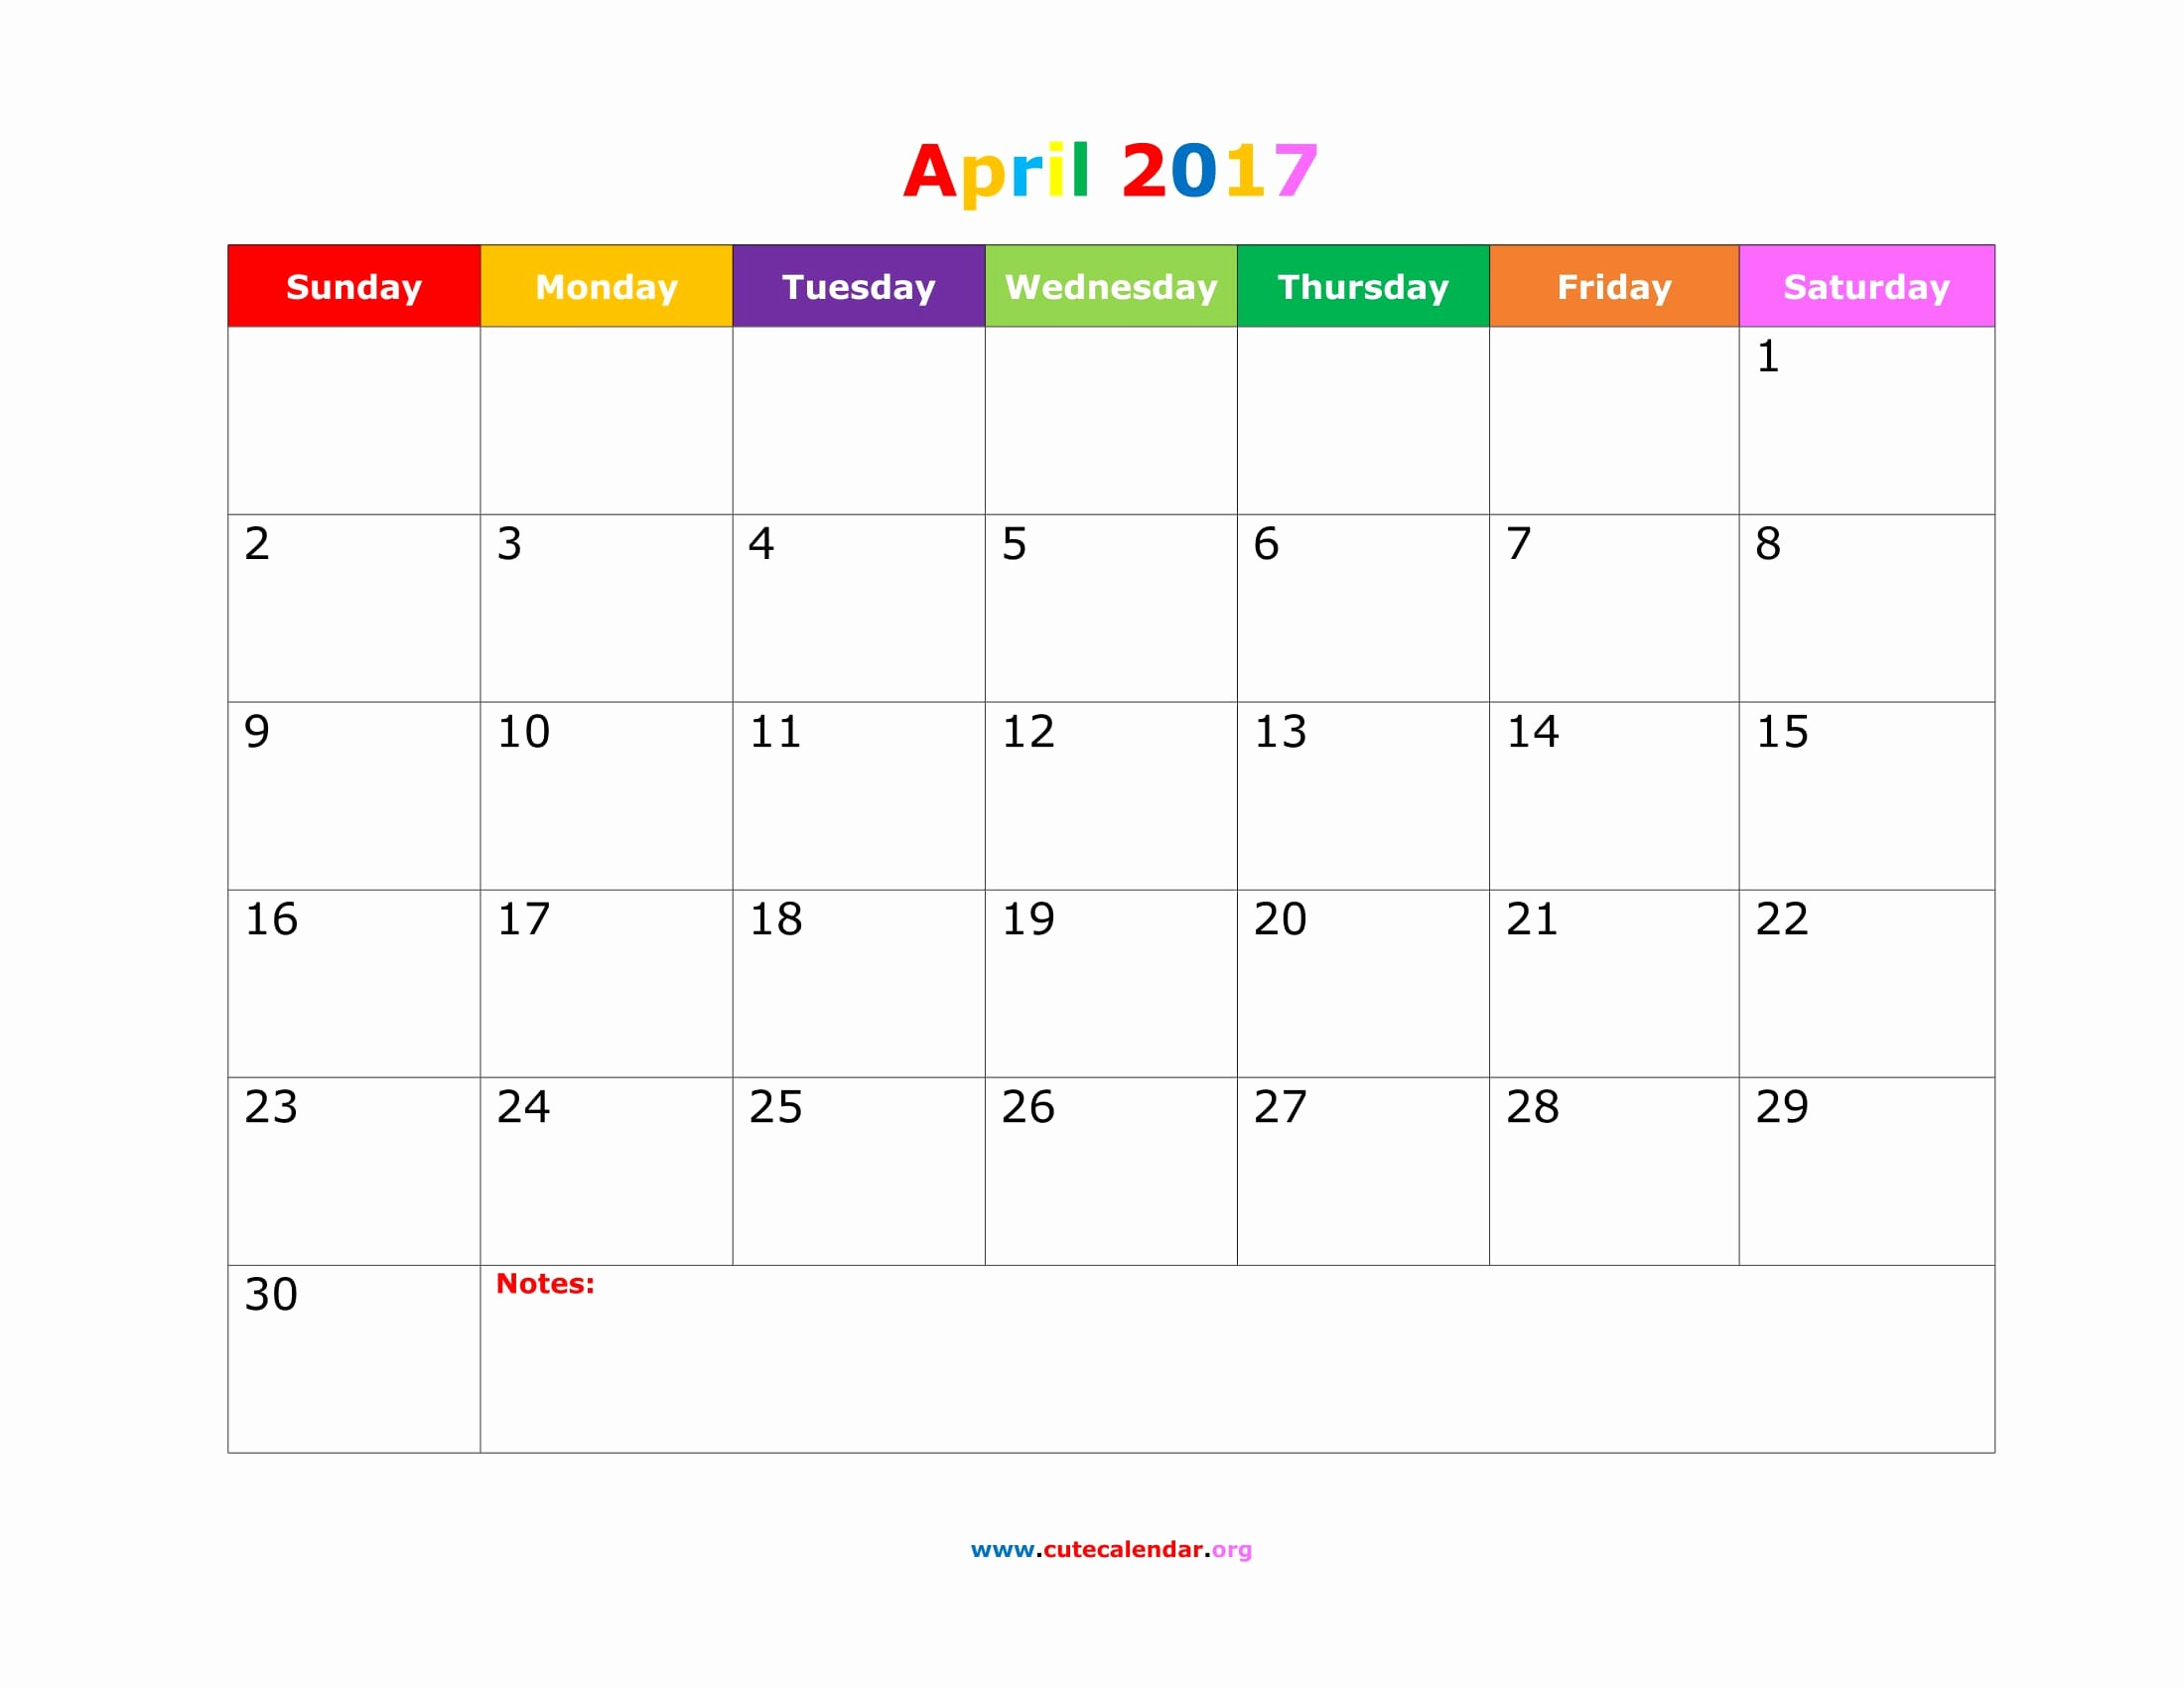 2017 Calendar Template Word Document New April 2017 Calendar Word